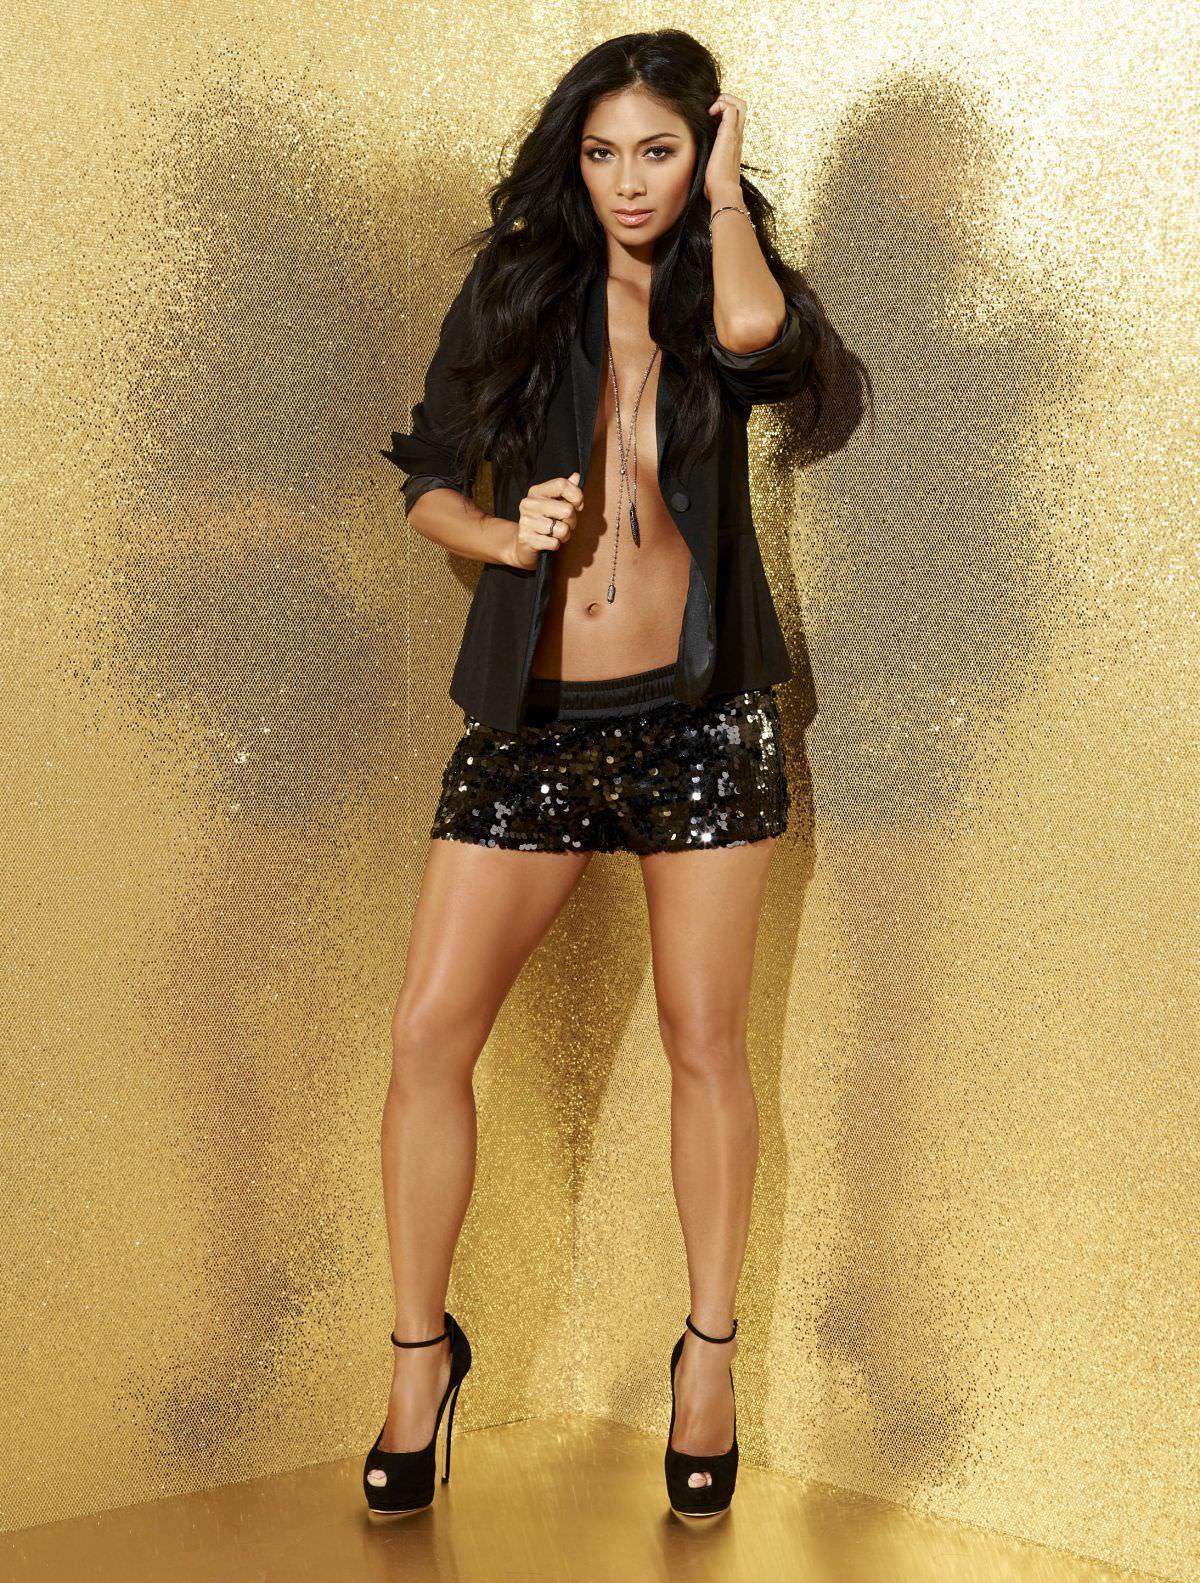 Nicole scherzinger sexy in three fashion combinations